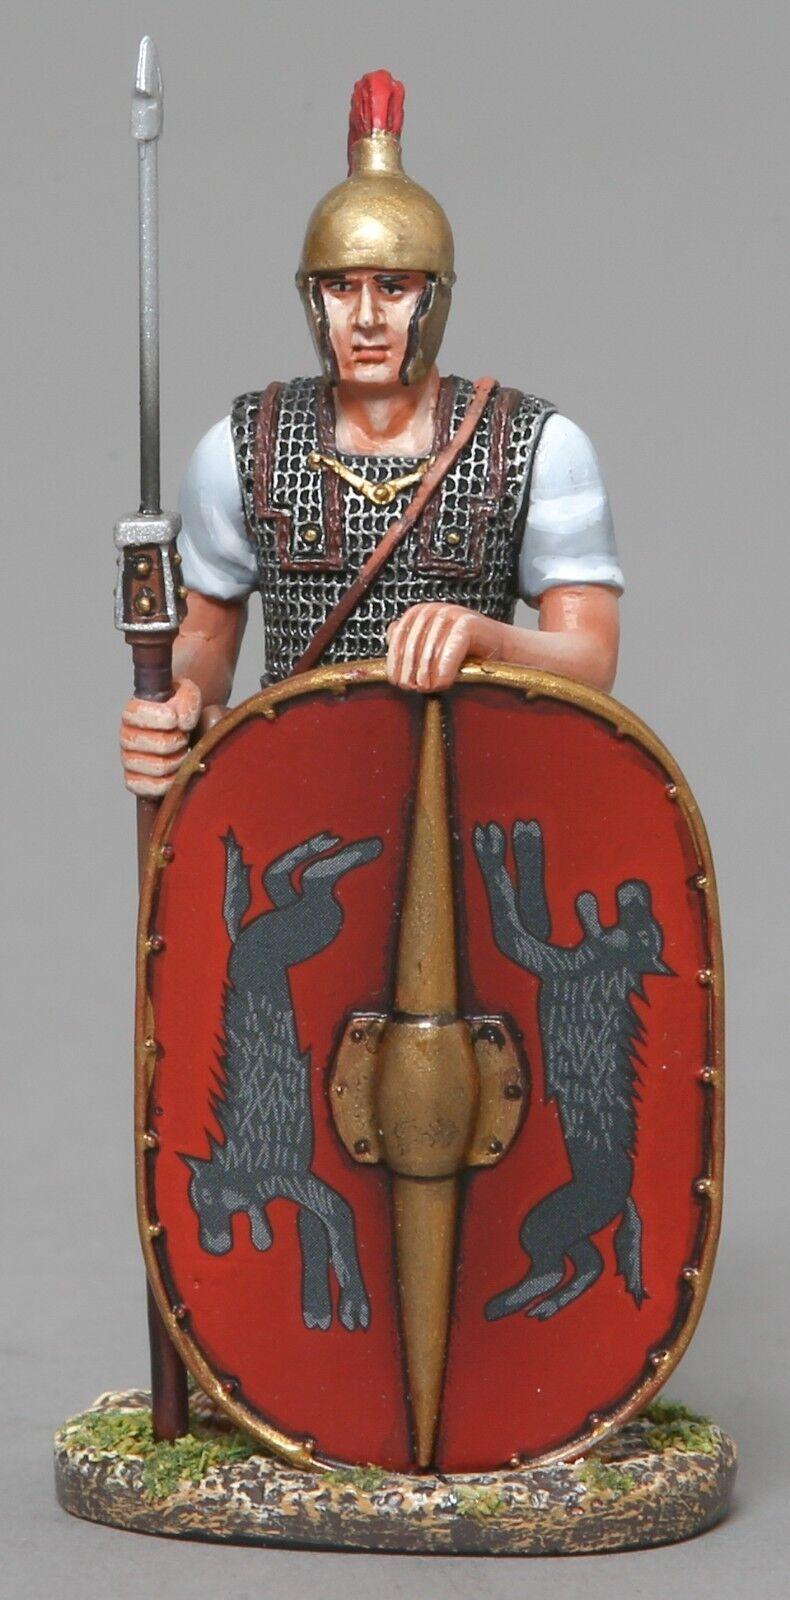 Thomas Gunn Roman Empire romrep001b Legionär stehend bereit Leaping Wolf MIB